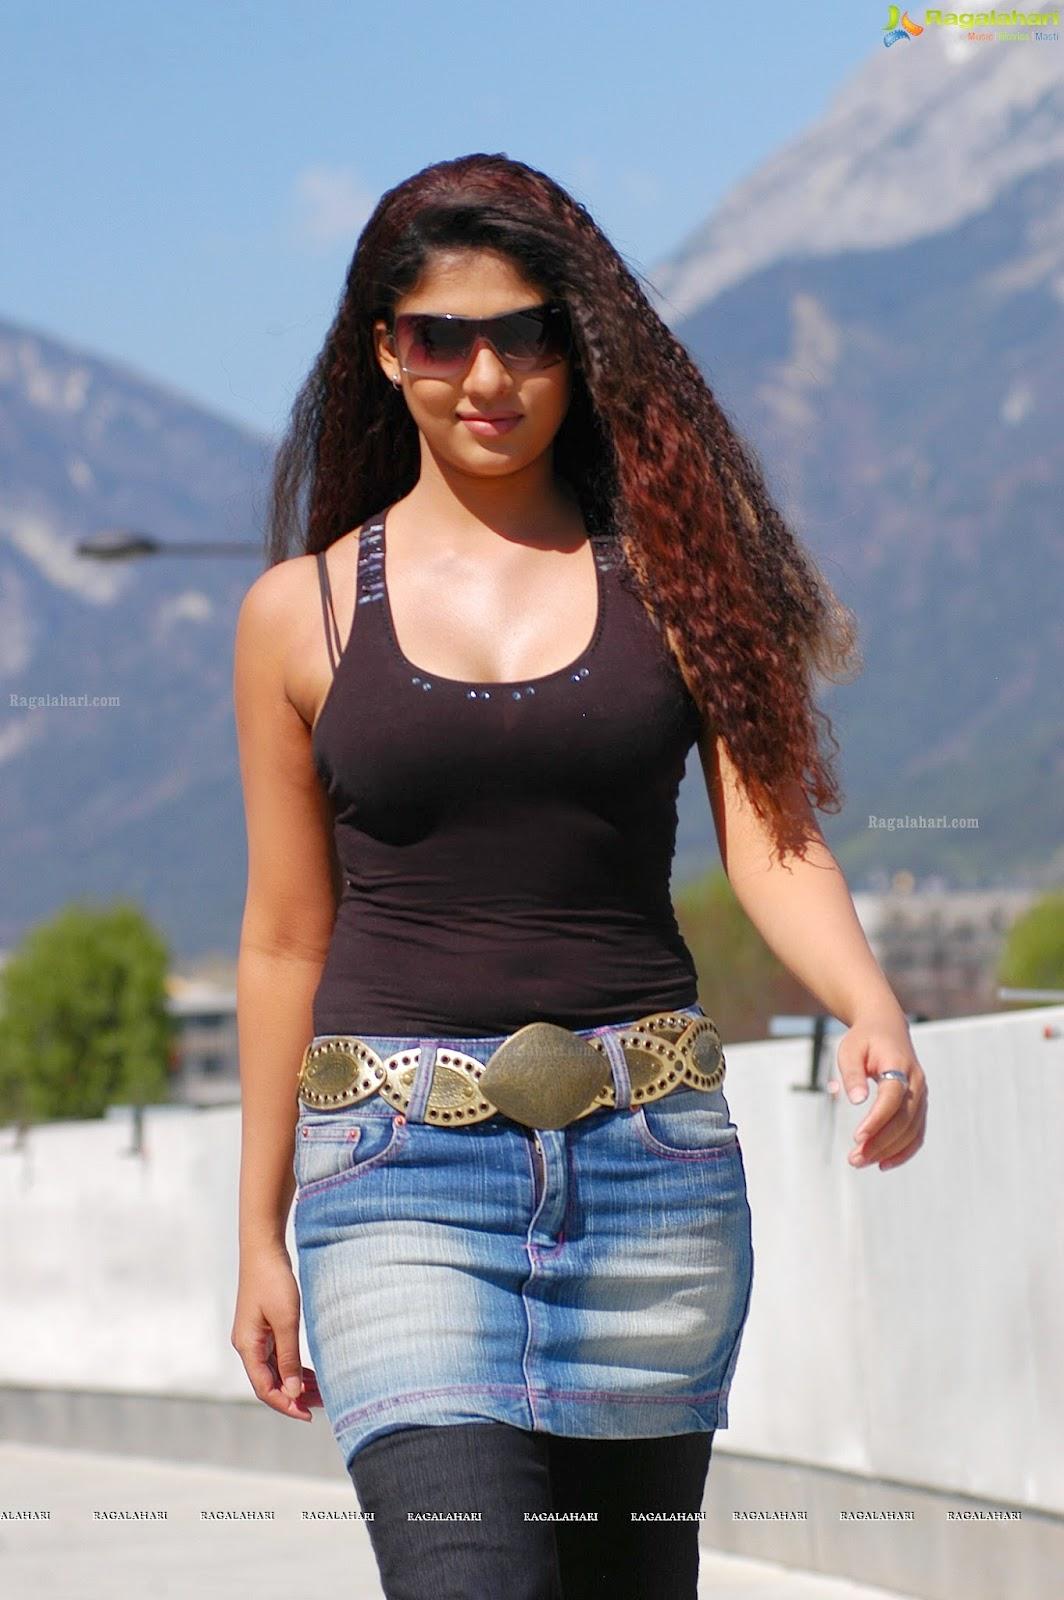 Nayanthara Hot In Black Bra Hd Images - Glamex-2503